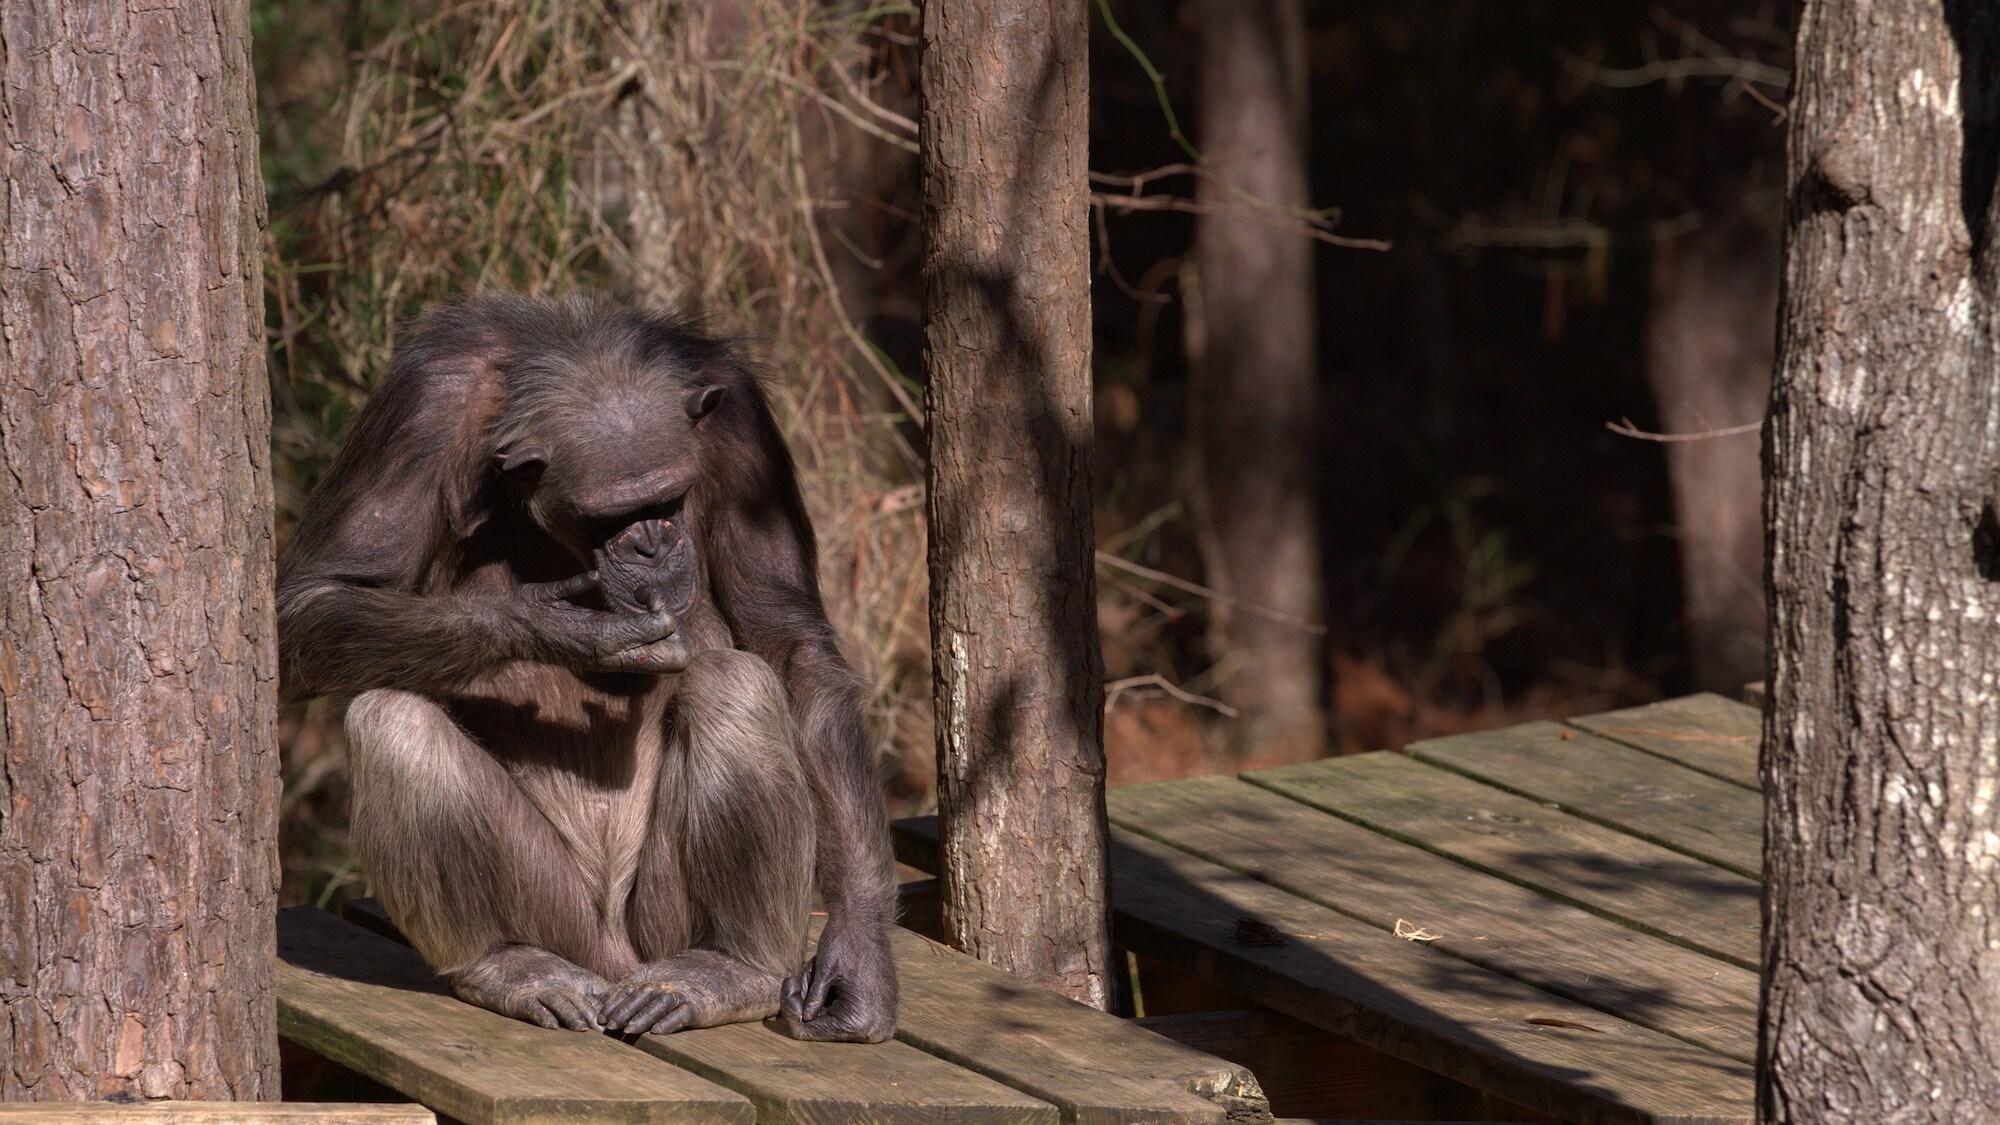 Flora sits on platform self-grooming. Sara Soda's group. (National Geographic/Jack Chapman)